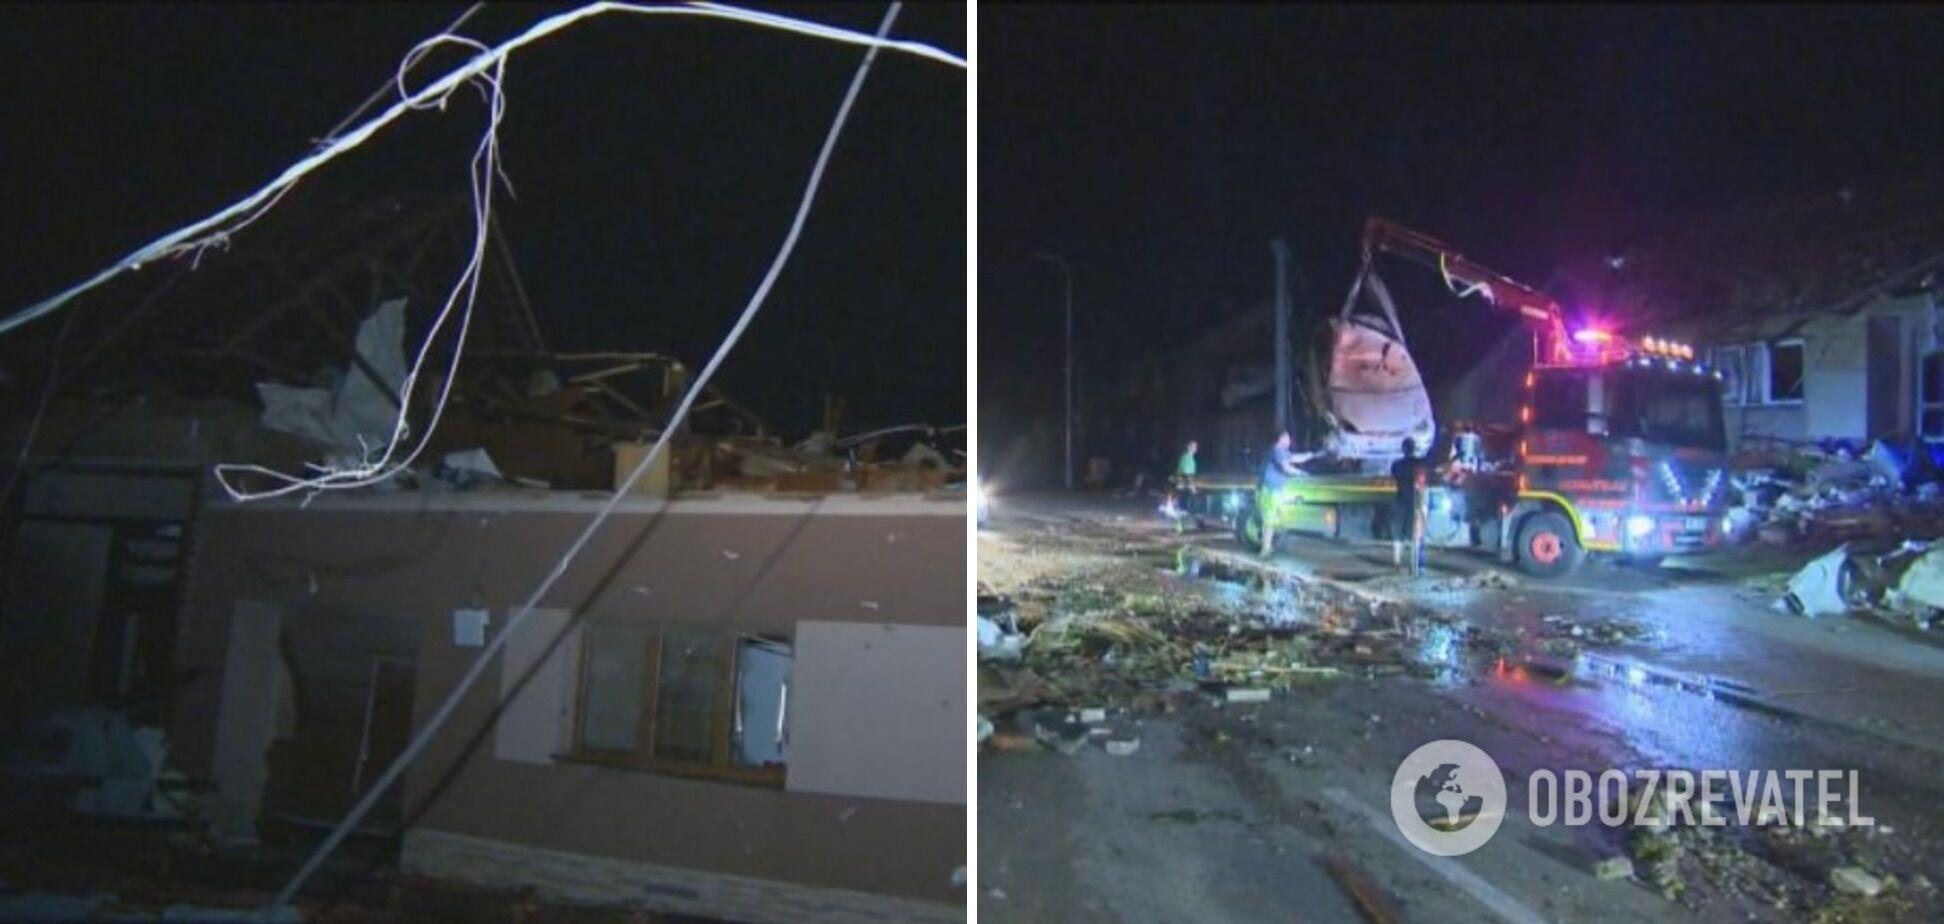 Непогода разрушила сотни домов